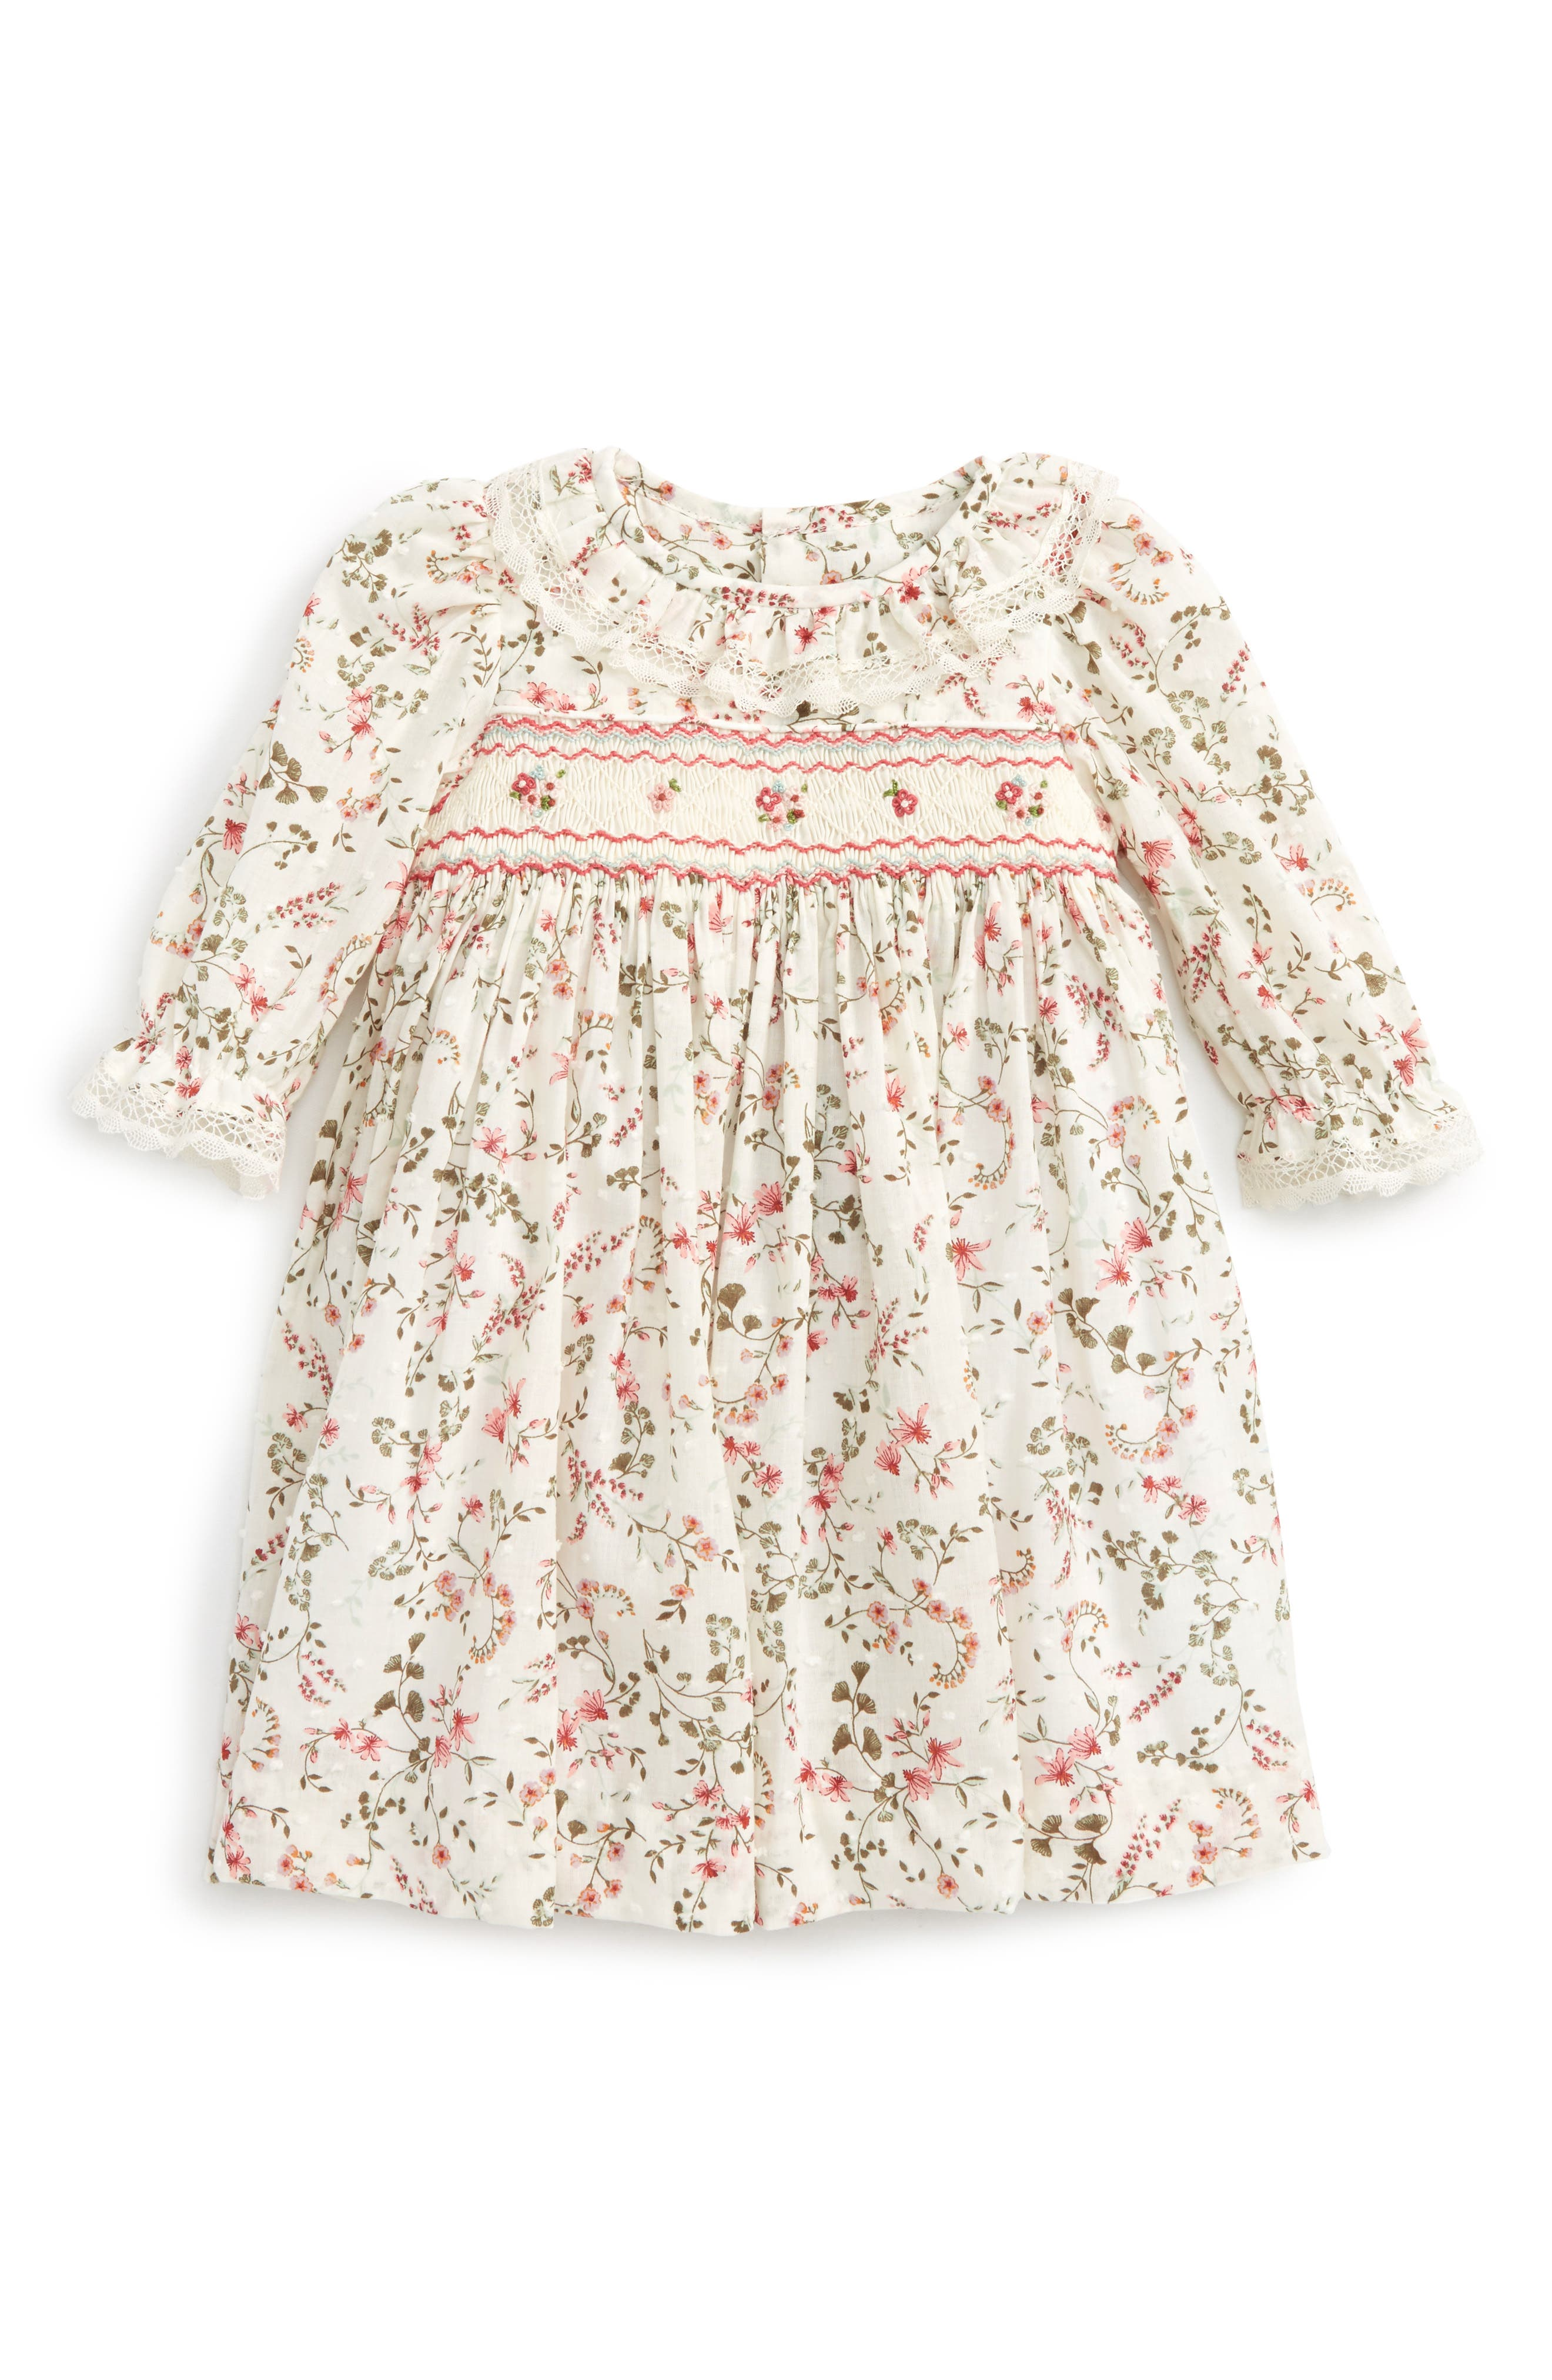 Alternate Image 1 Selected - Luli & Me Floral Print Plumetis Smocked Dress (Baby Girls)